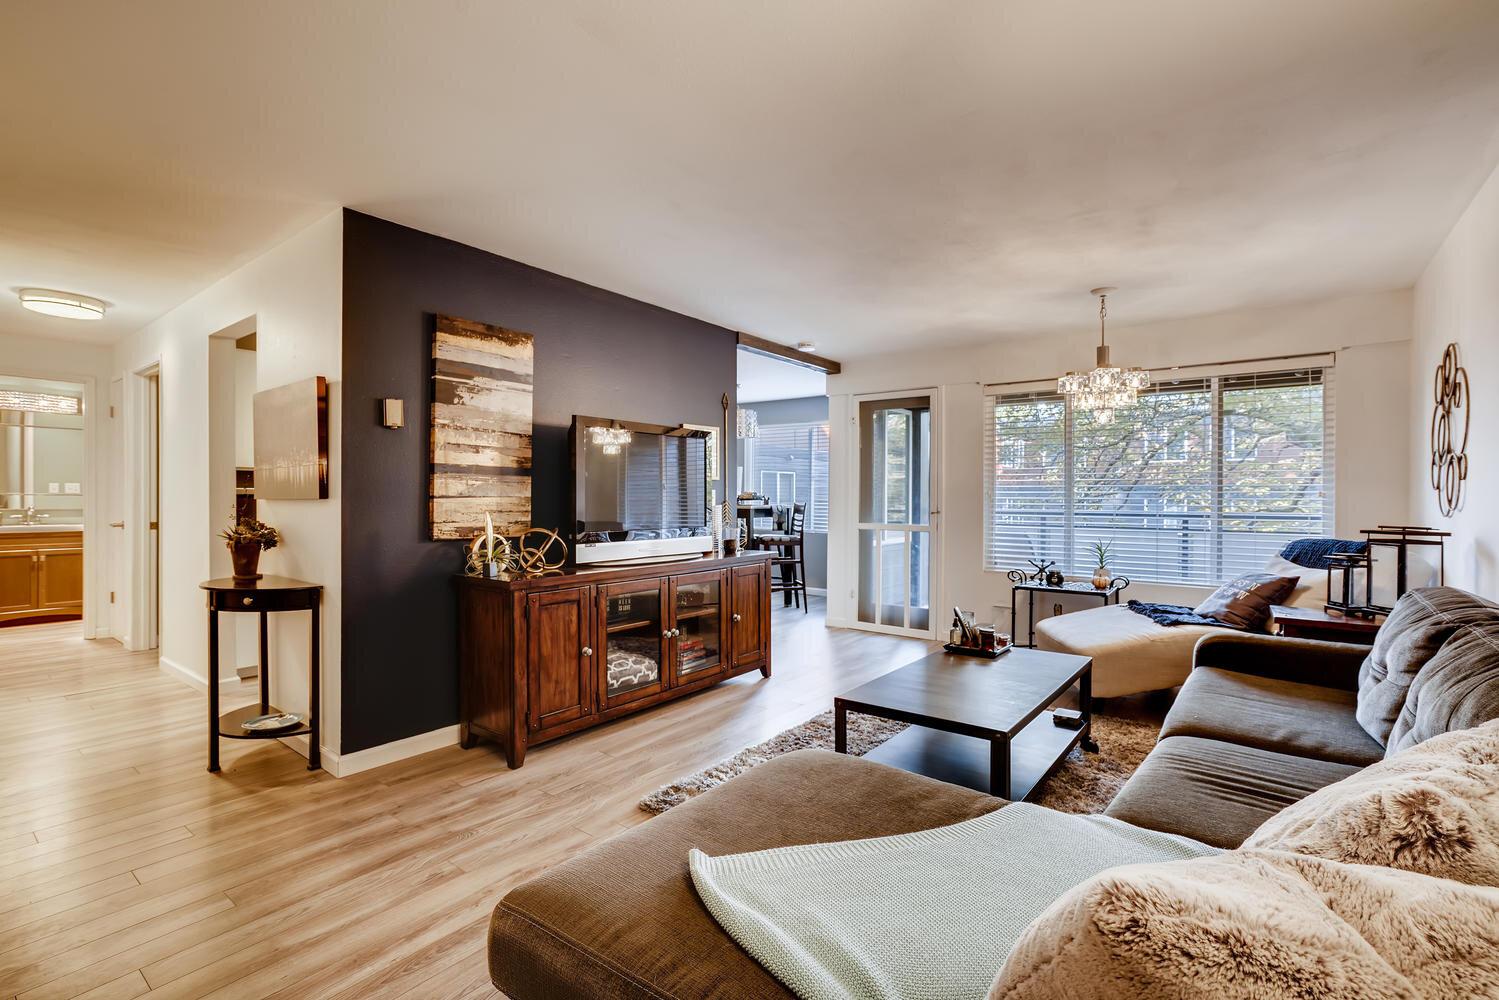 7021 Sand Point Way  B210-large-007-001-Living Room-1499x1000-72dpi.jpg